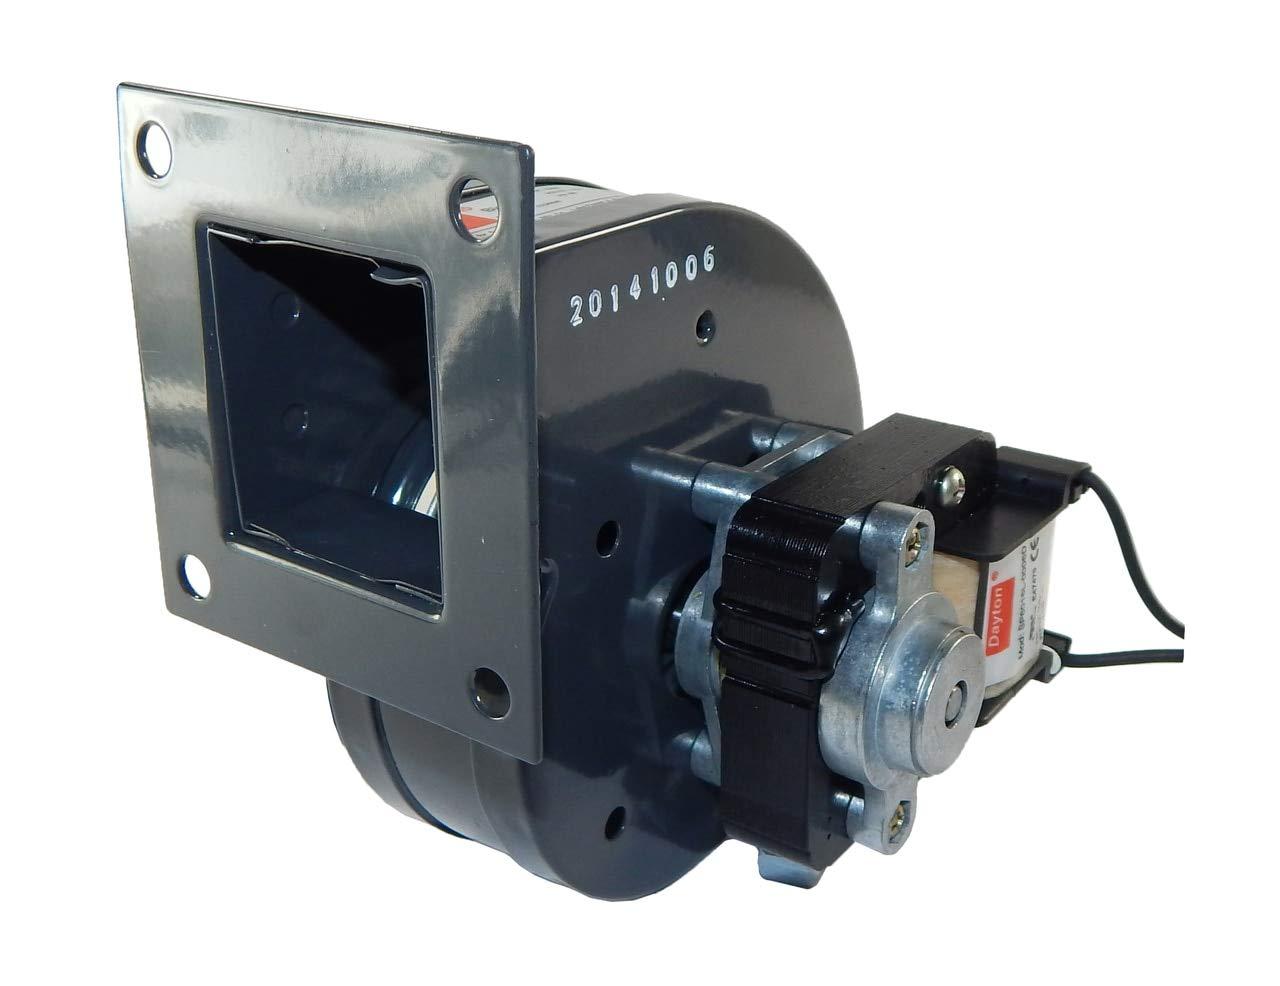 Dayton Rectangular OEM Blower With Flange, Voltage 115, 3233 RPM, Wheel Dia. 2-15/16'' - 1TDN3